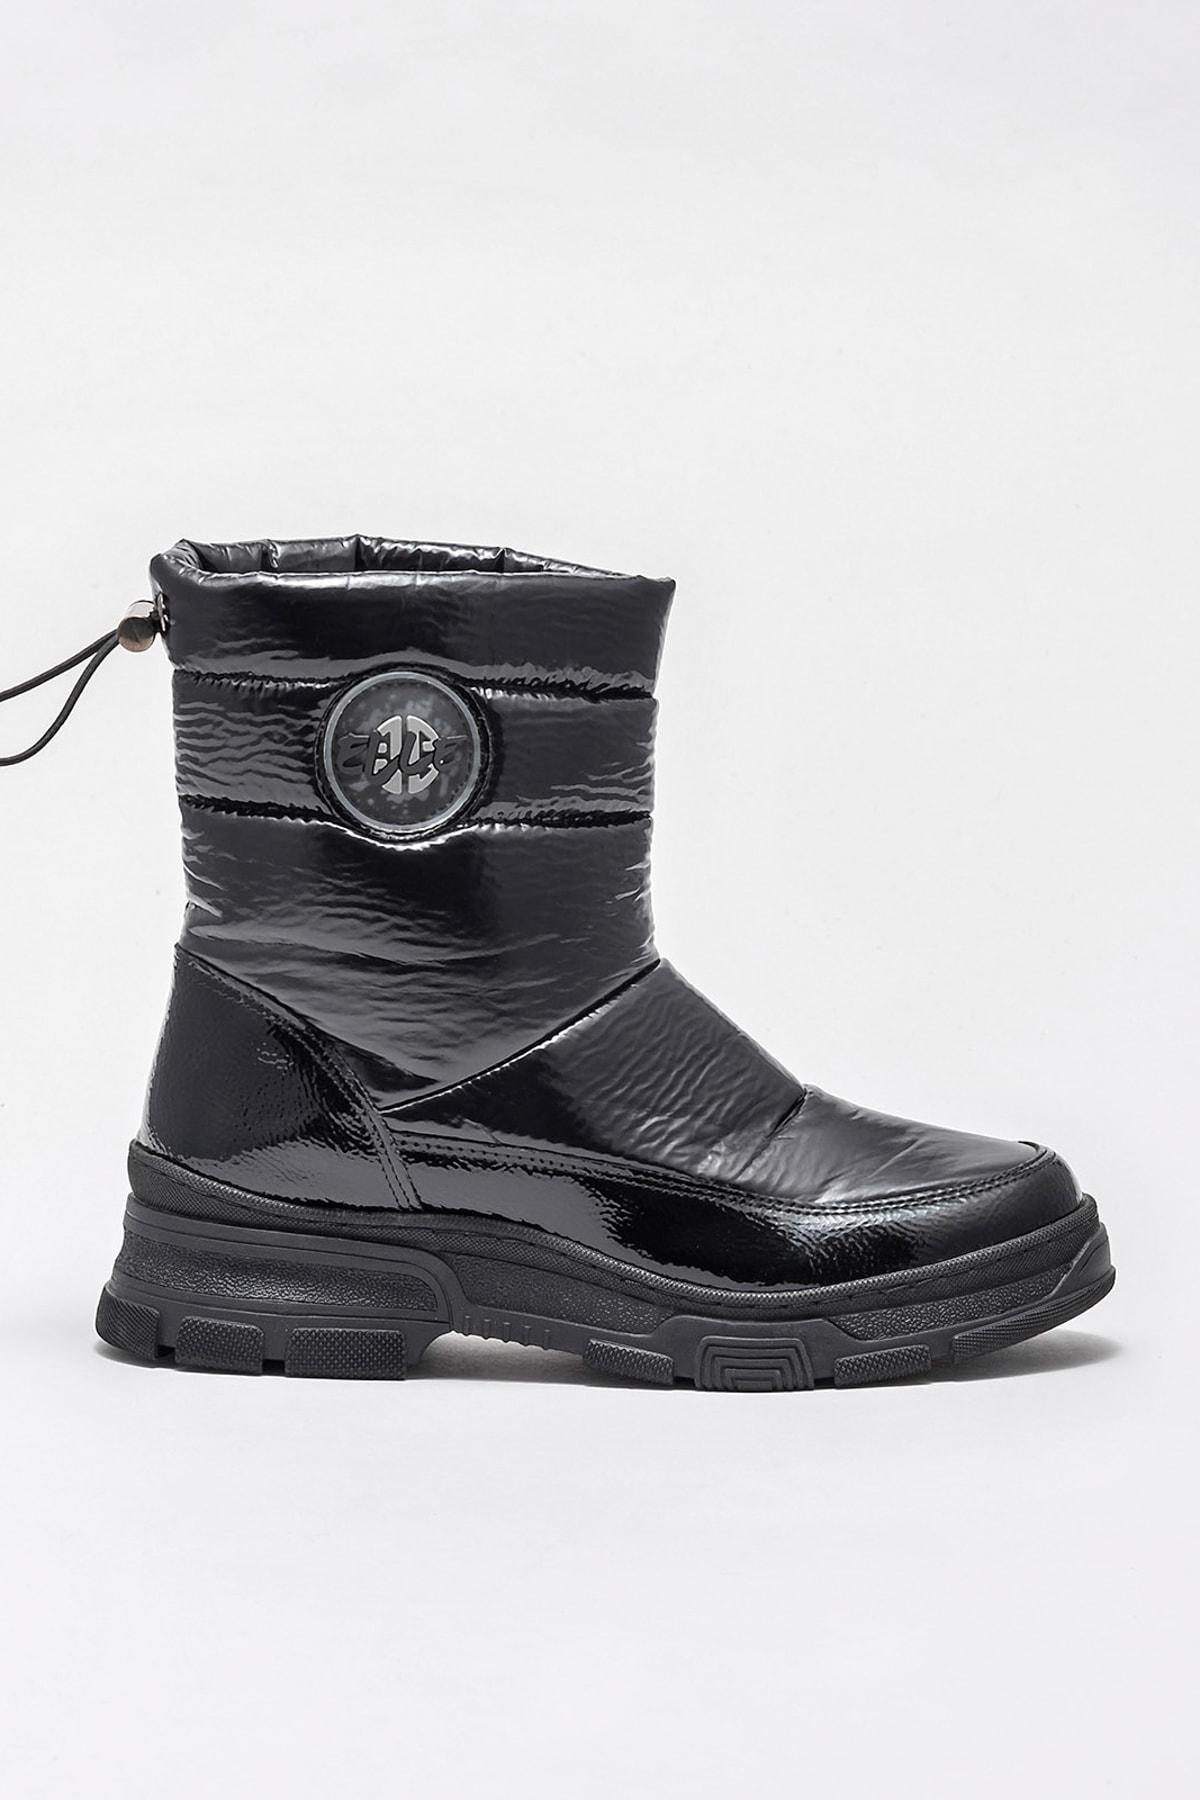 Elle Shoes Kadın Petula Sıyah Bot & Bootie 20KAYMB103 1